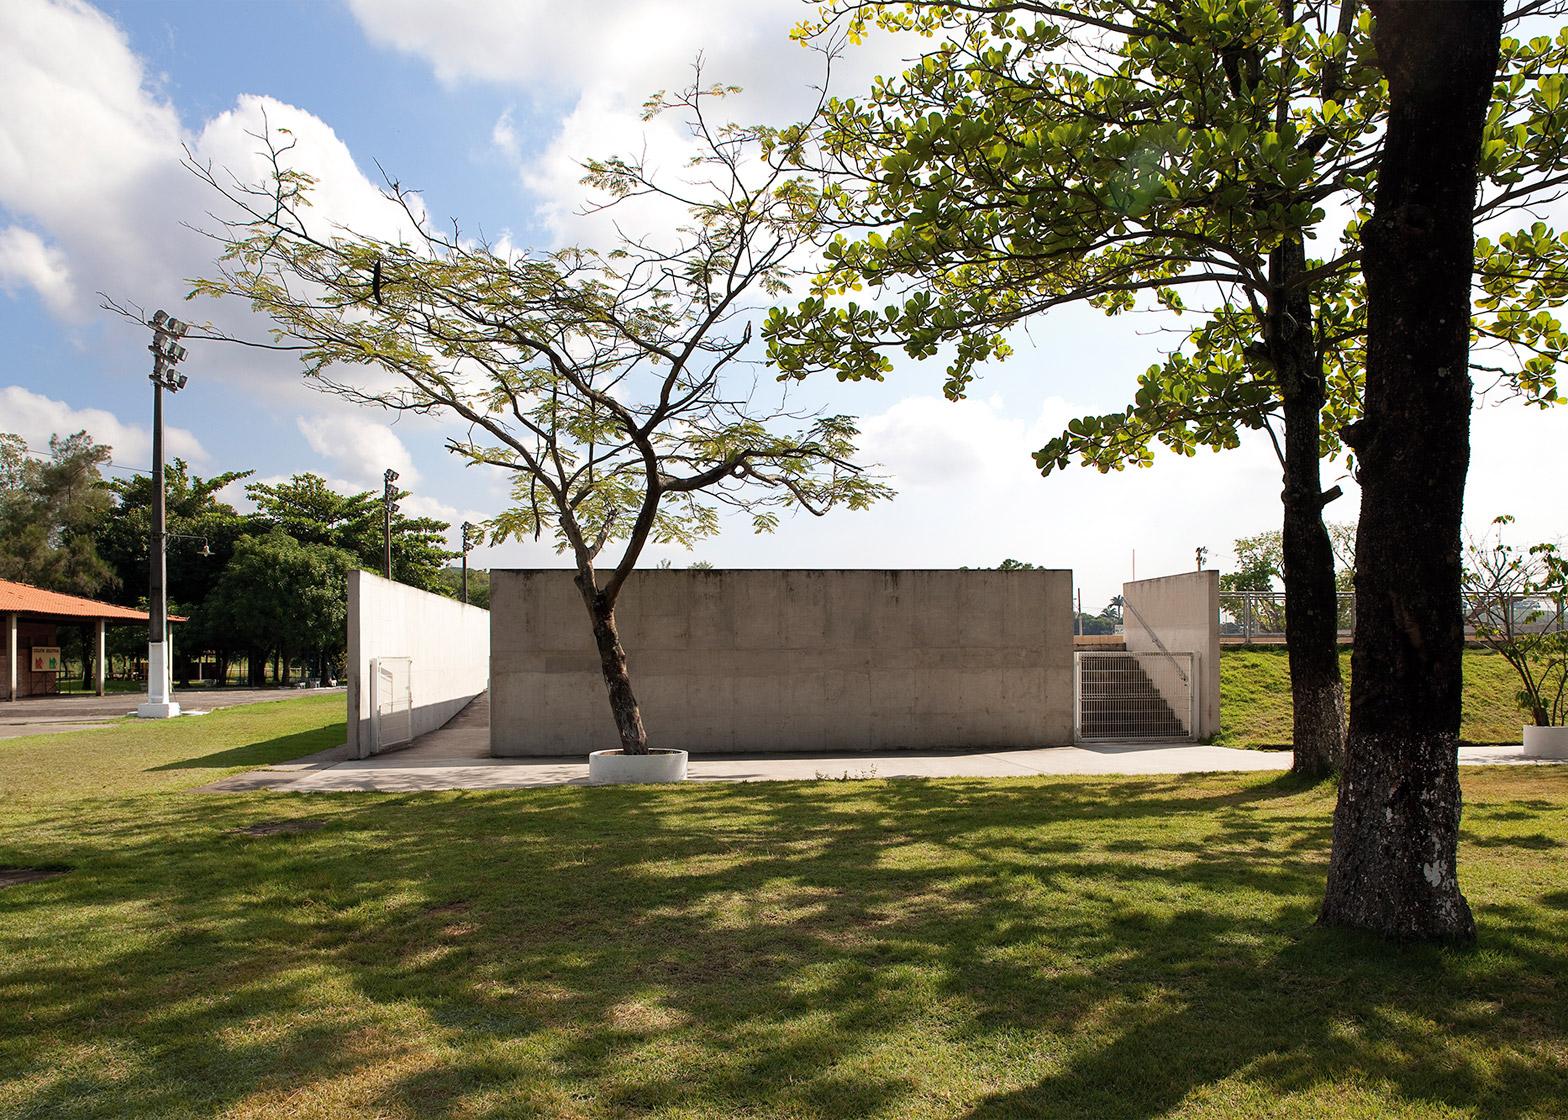 Modern Pentathlon arena, Deodoro Olympic Park, by BCMF Arquitetos, Bruno Campos, Marcelo Fontes and Silvio Todeschi